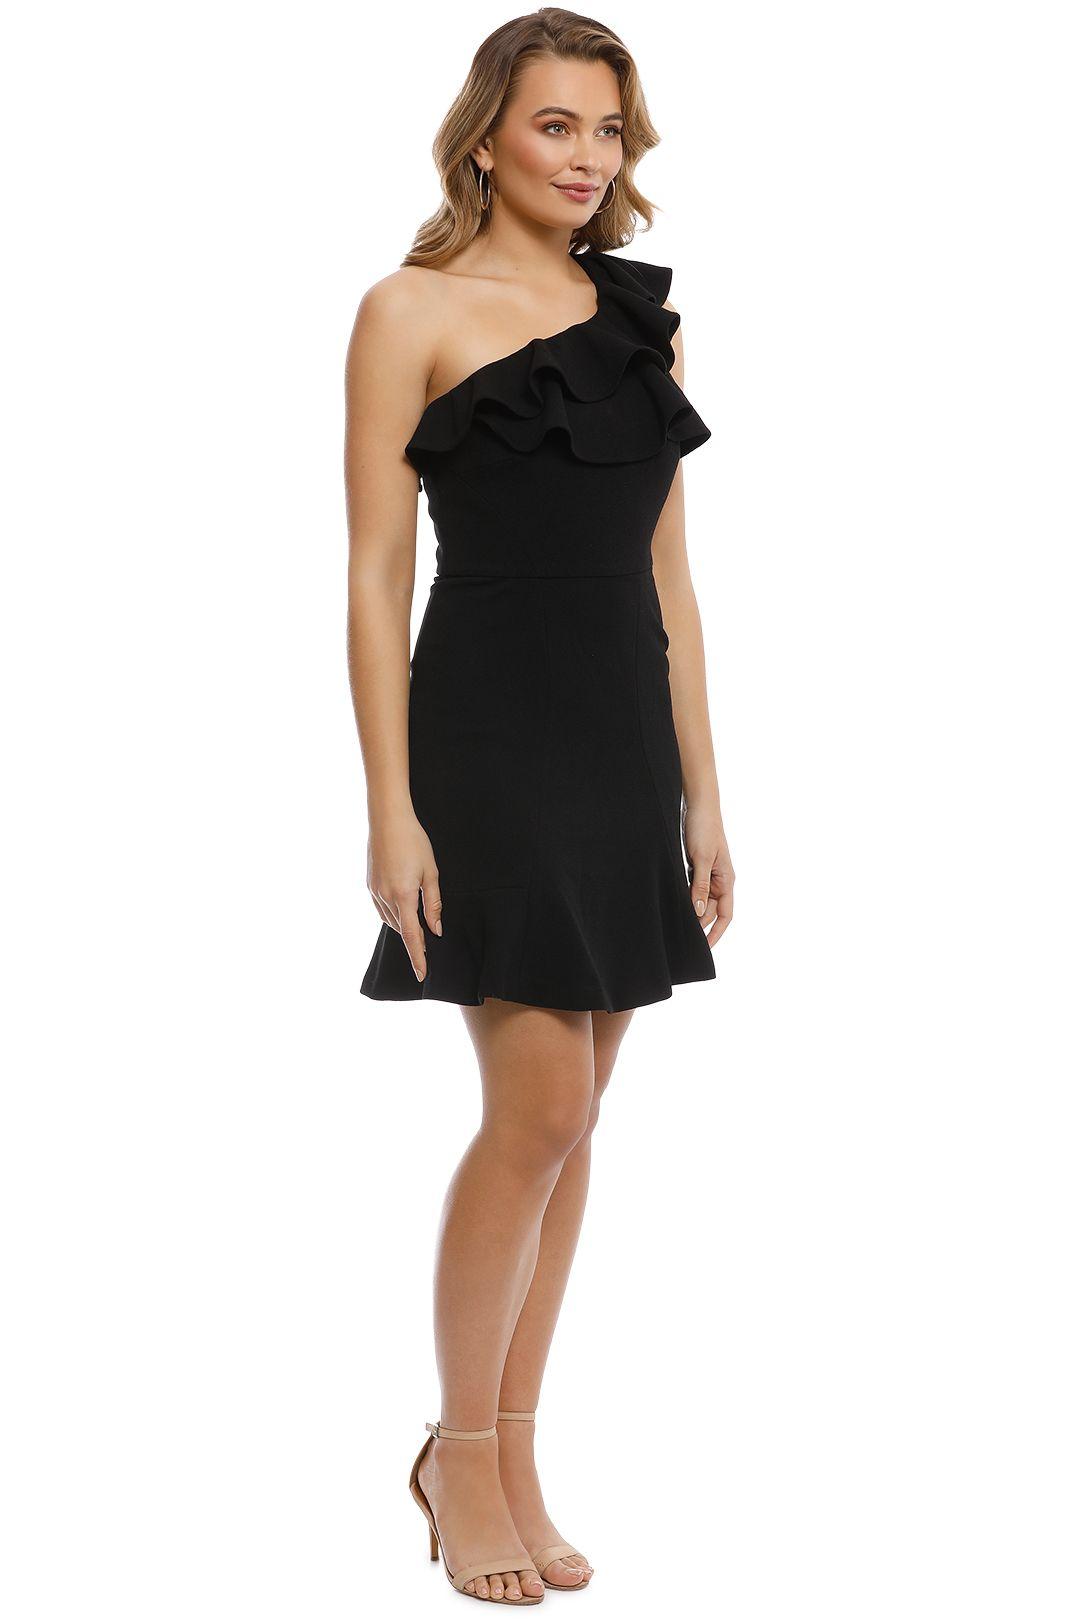 Rebecca Vallance - Paparazzi Drape Long Sleeve Dress - Side